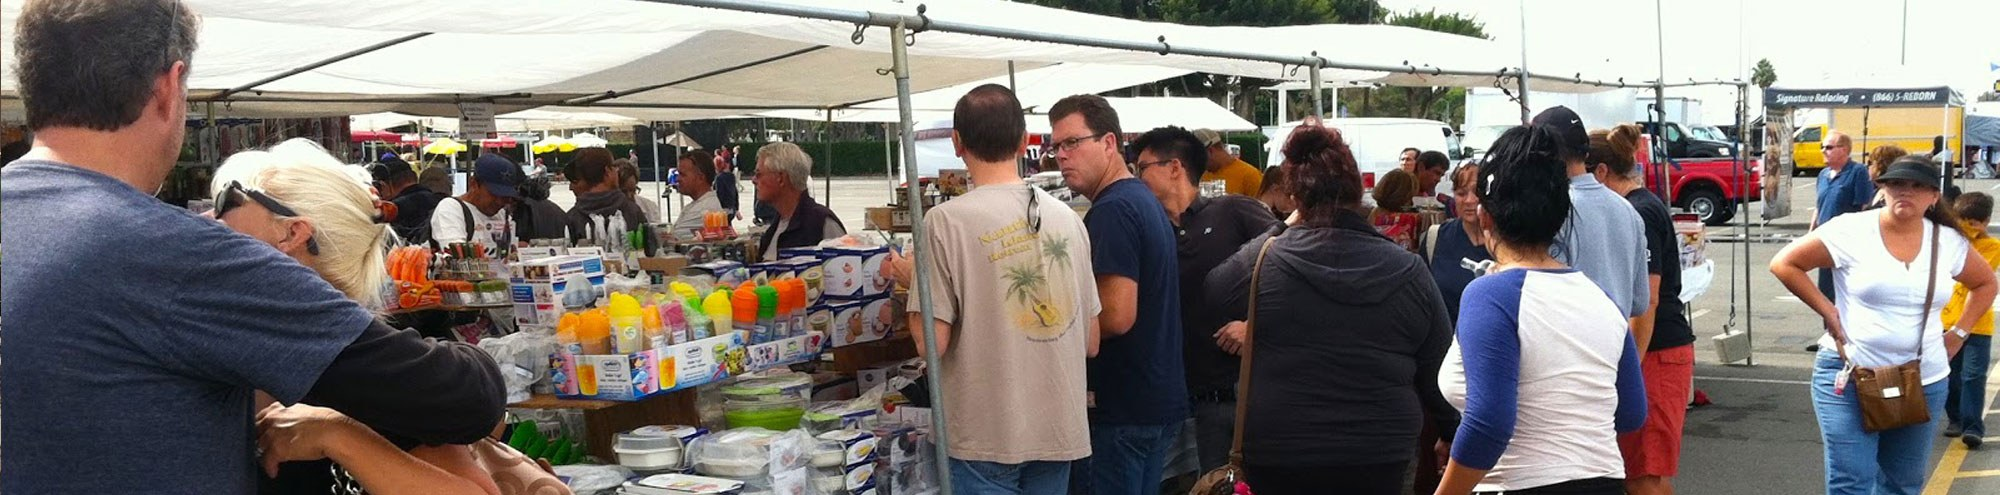 Orange County Market Place Oc Swap Meet Costa Mesa